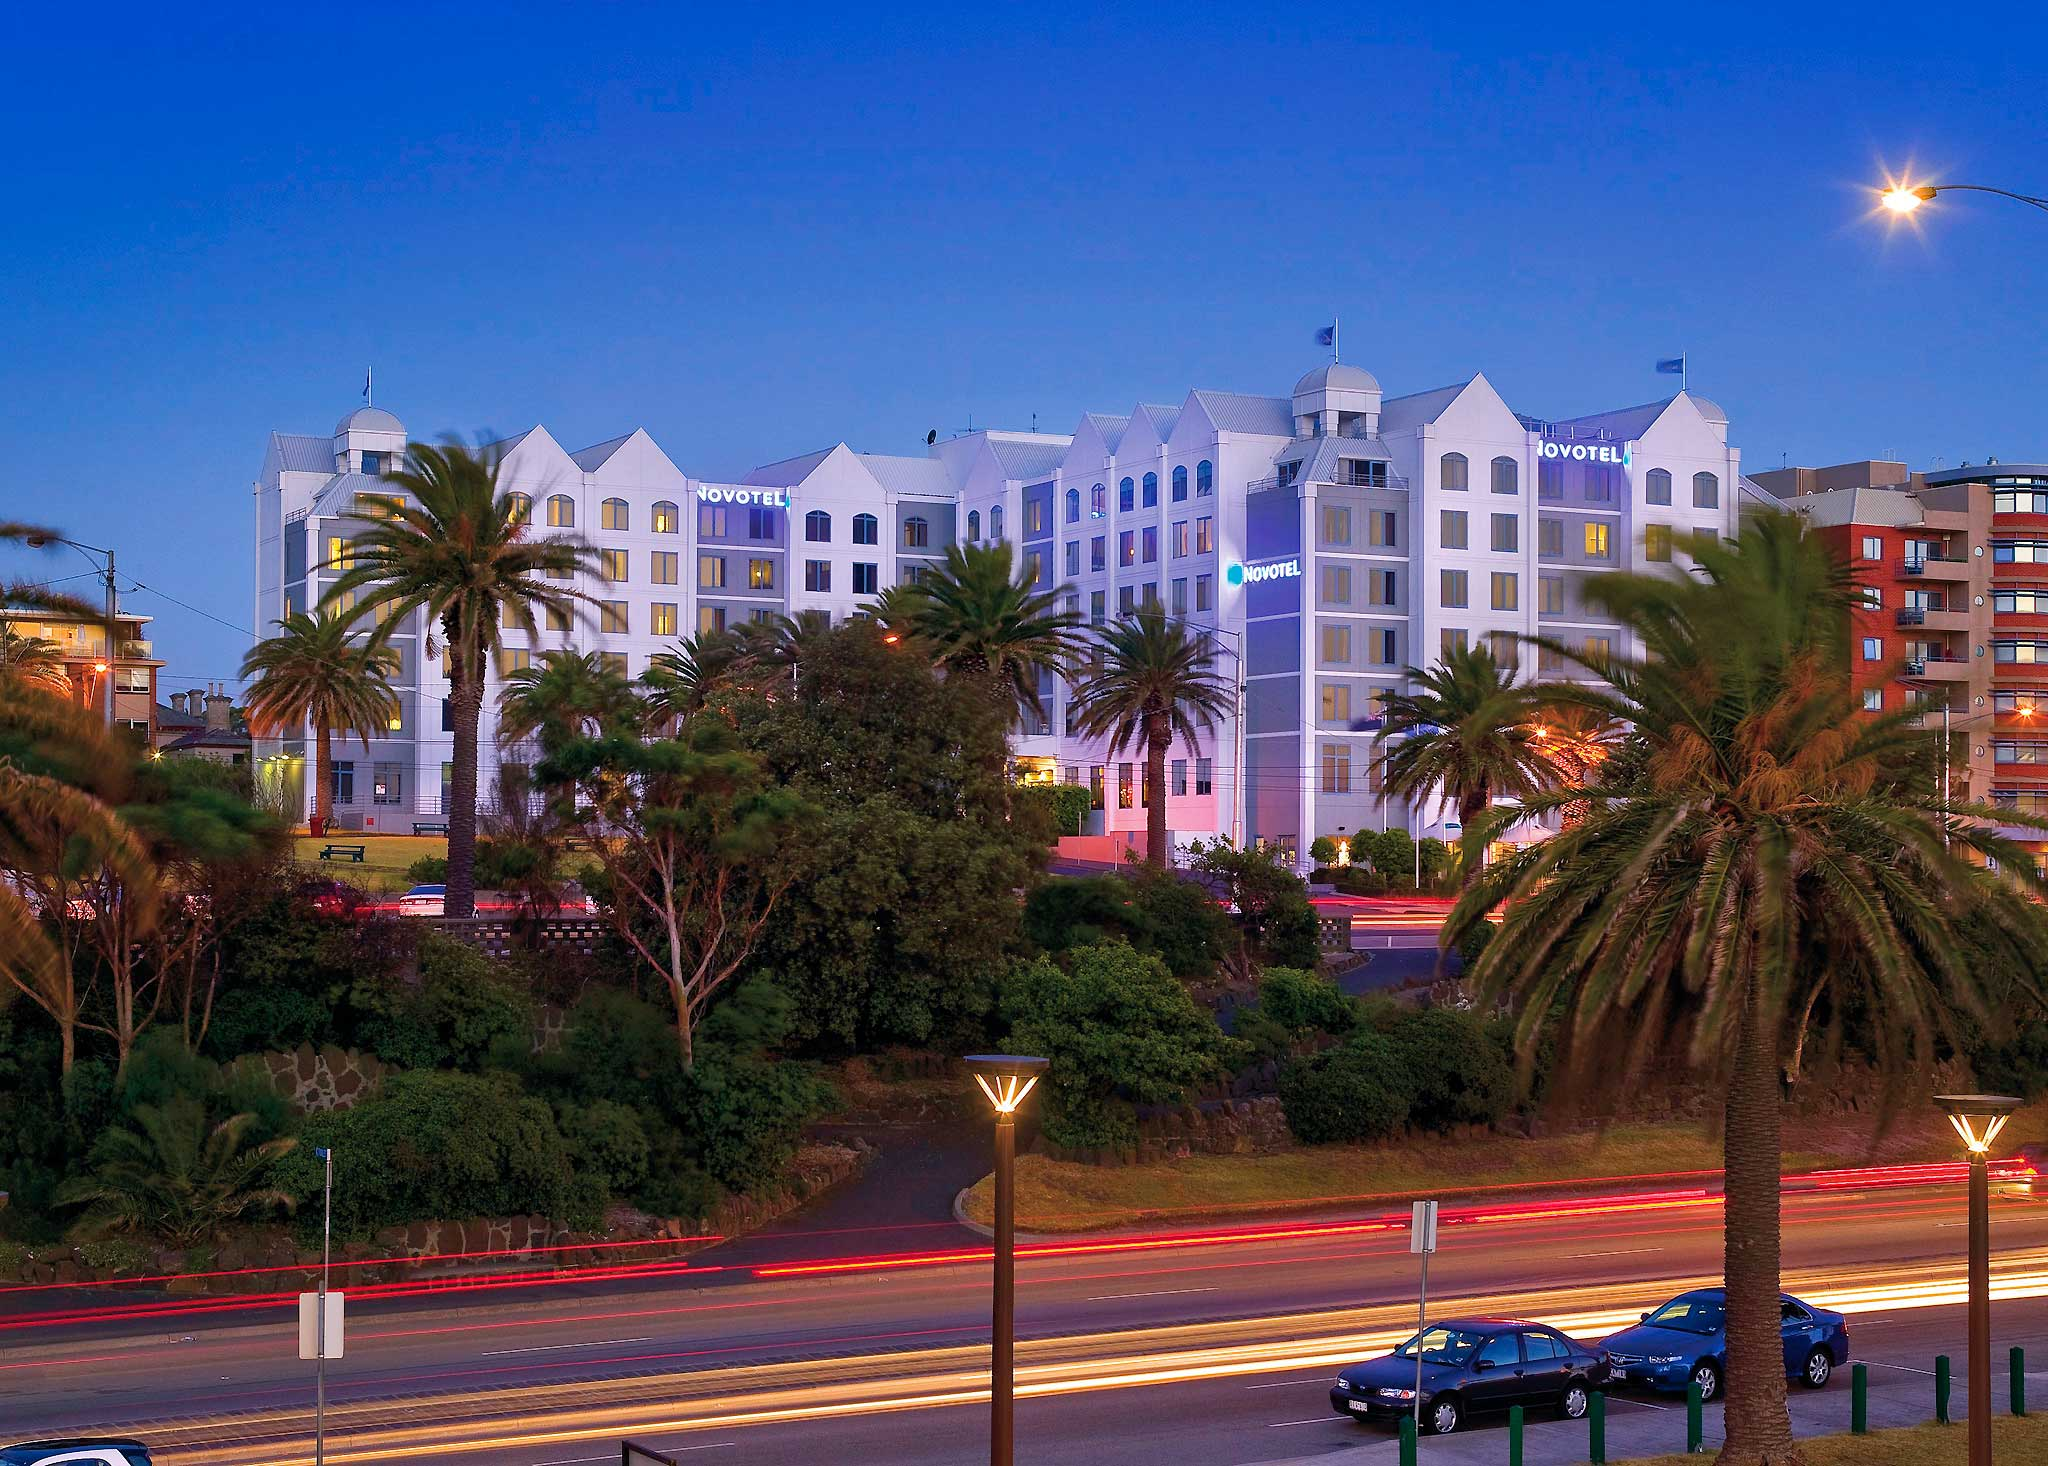 Hotell – Novotel Melbourne St Kilda